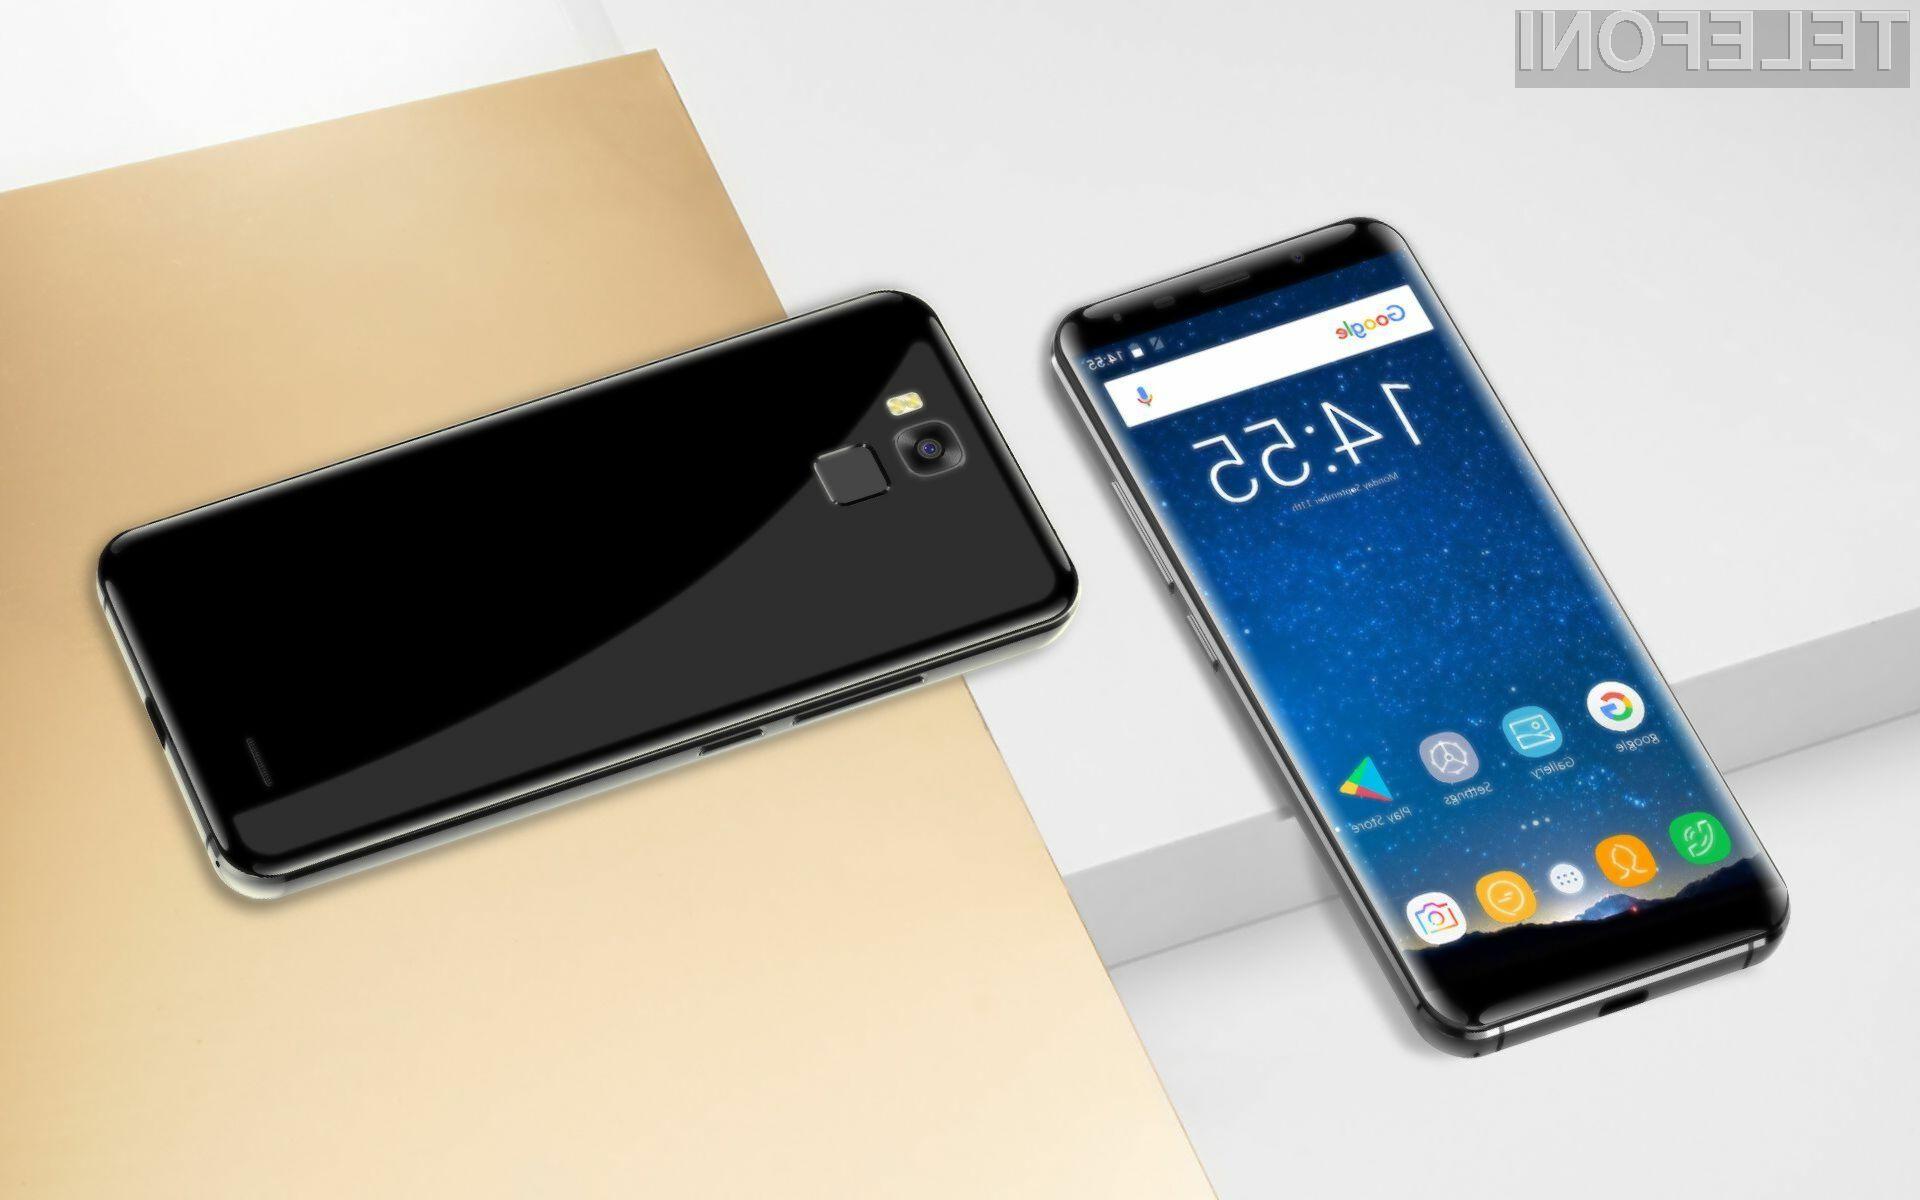 Pametni mobilni telefon Oukitel K5000 je zmogljiv, a poceni!